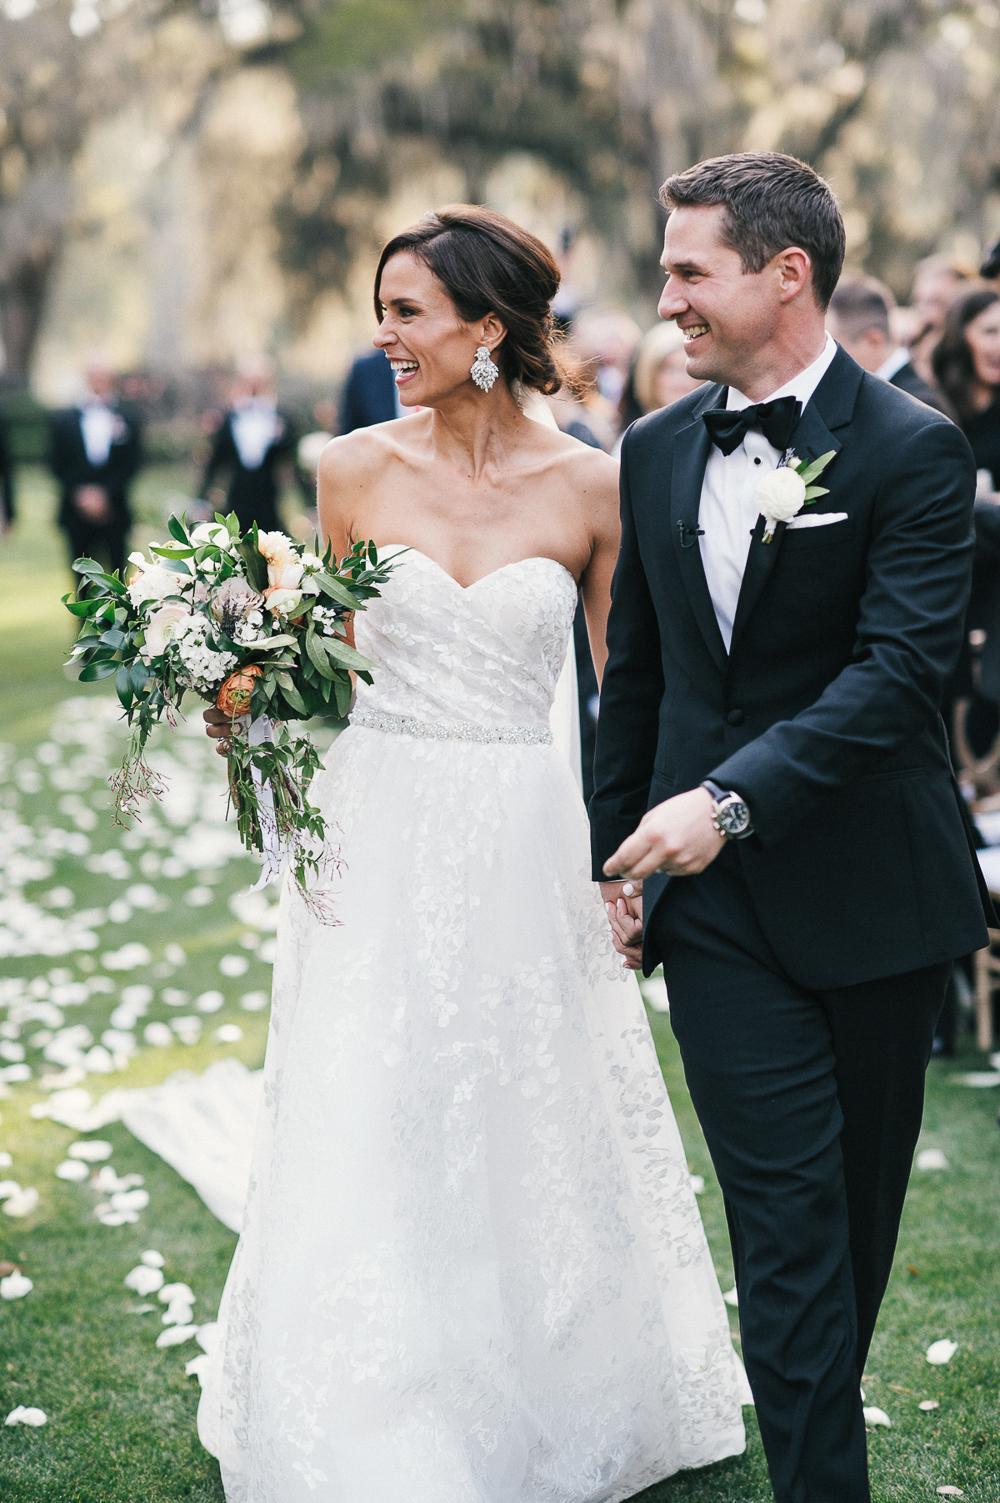 ford_plantation_savannah_classic_timeless_blush_white_romantic_wedding_inspiration023.jpg